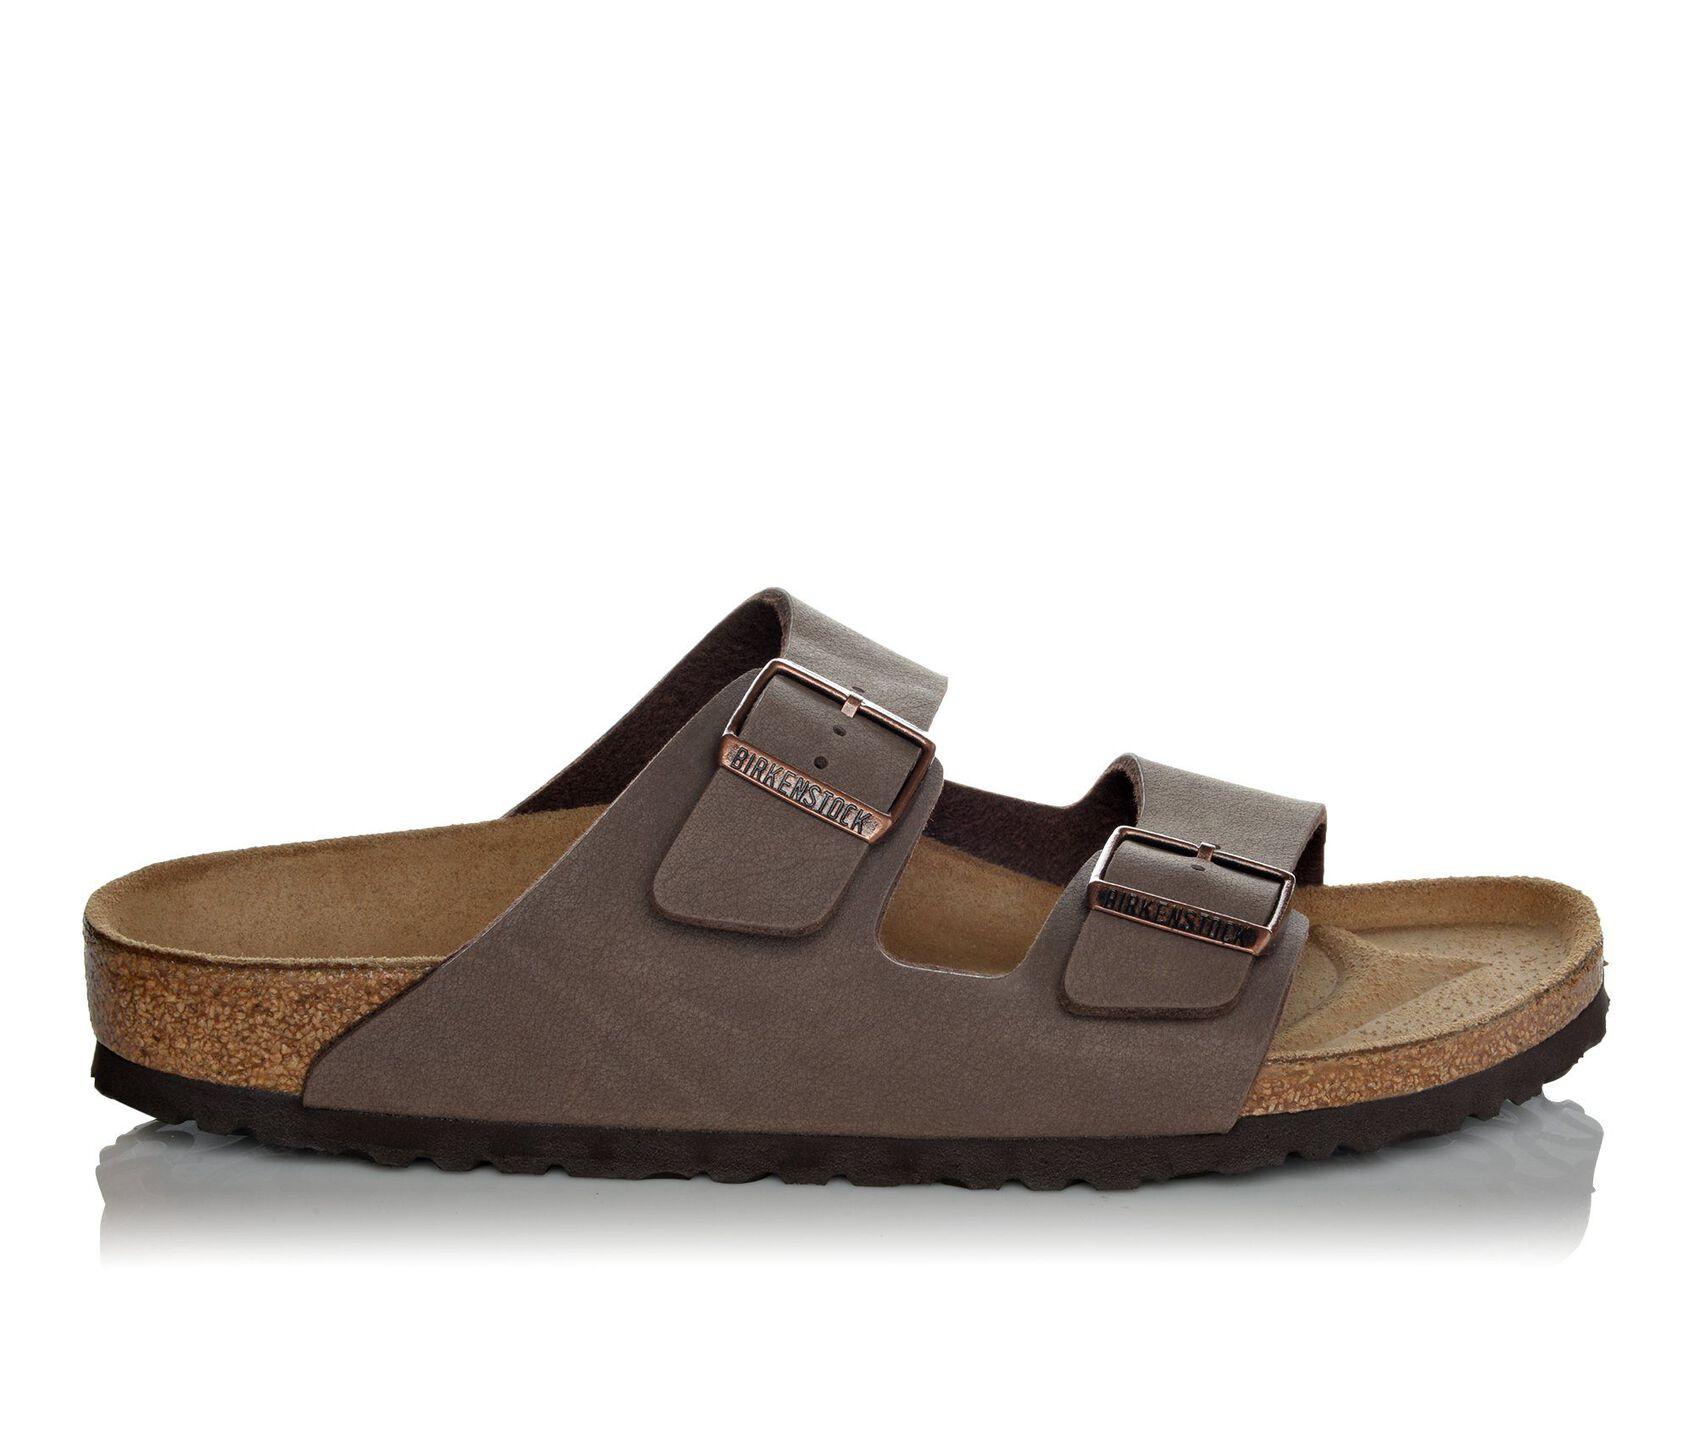 3c4bf858f4ae ... Birkenstock Arizona 2 Buckle Outdoor Sandals. Previous